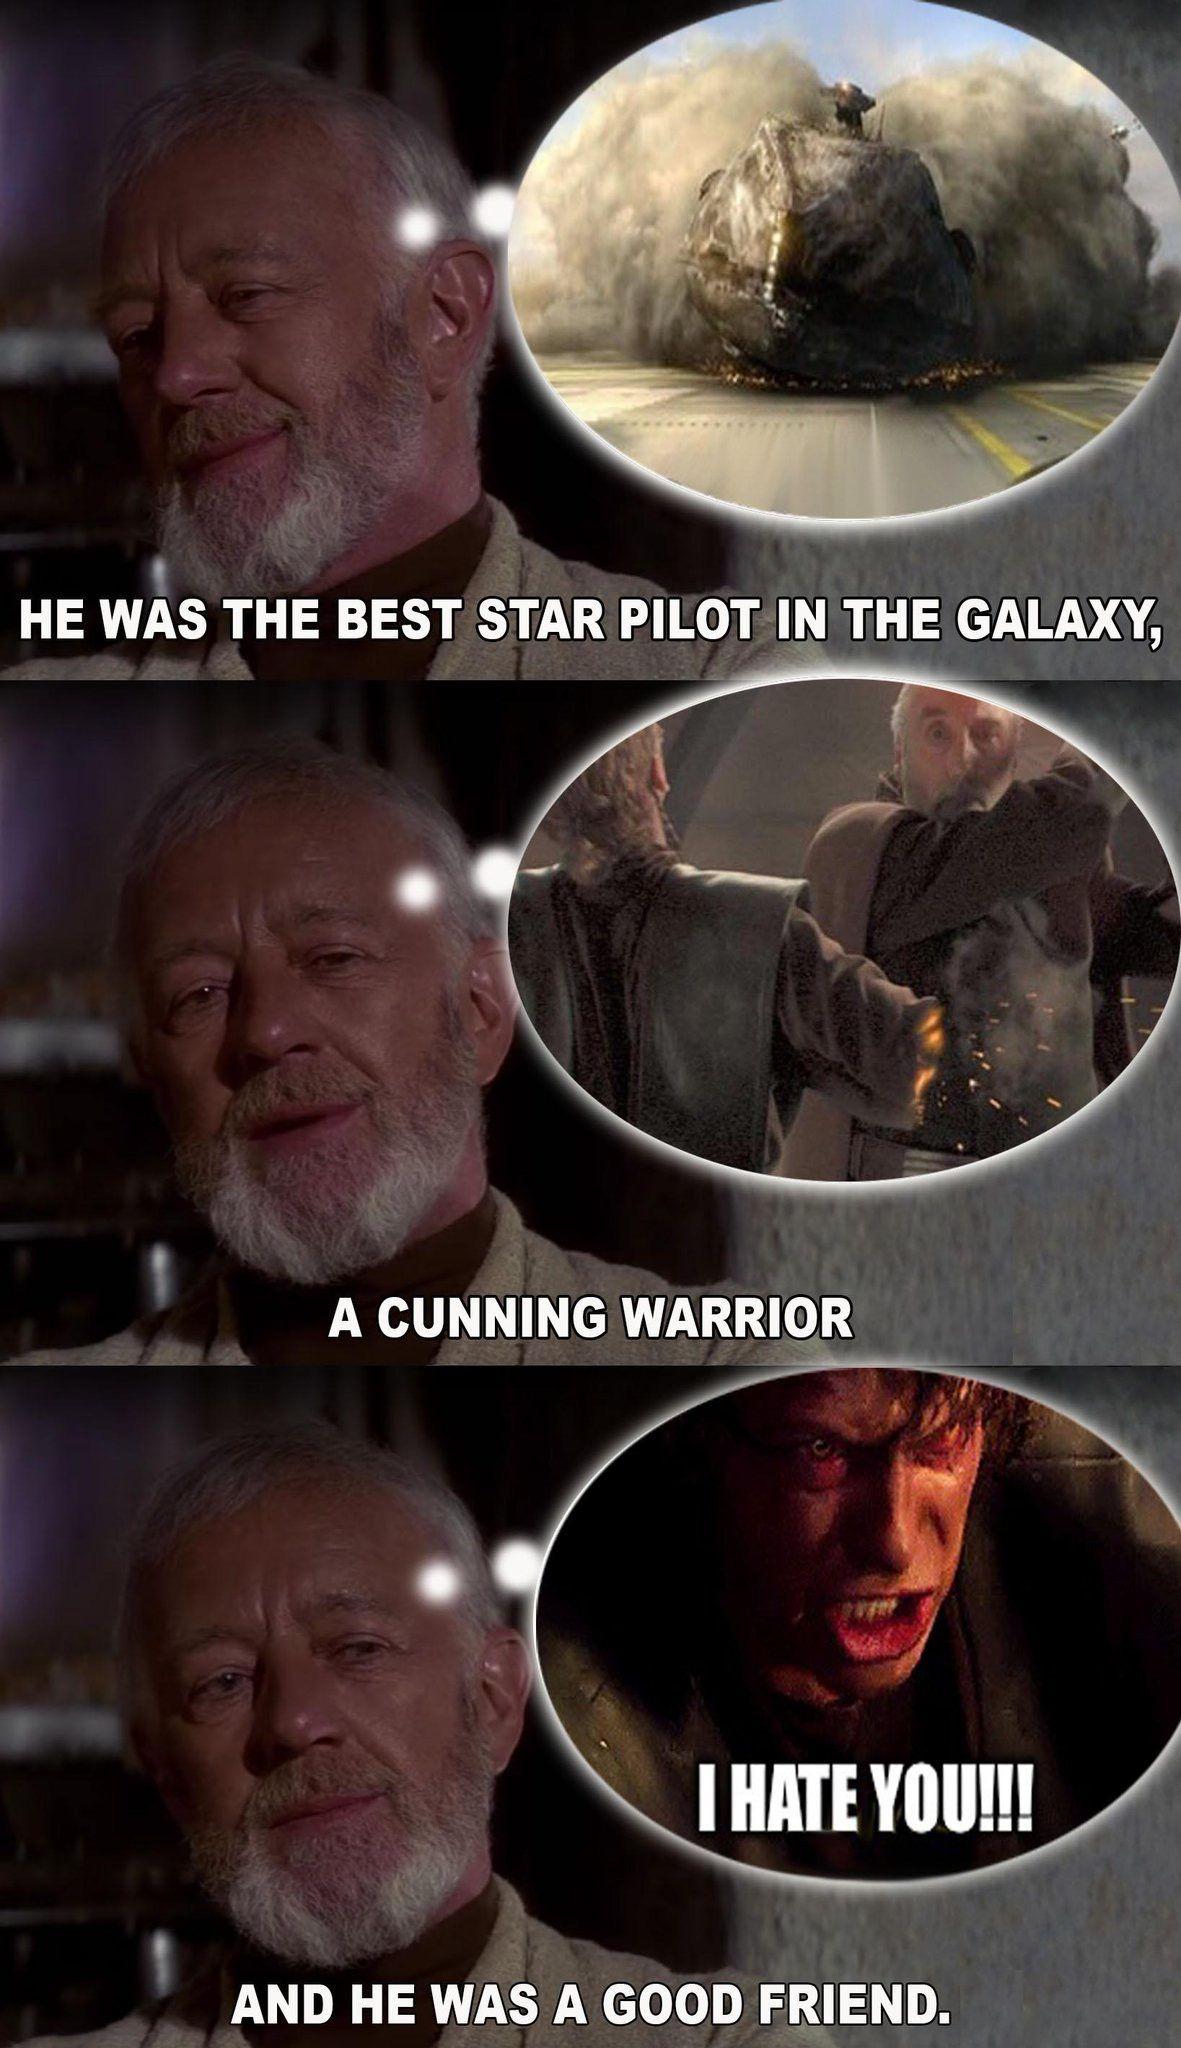 Pin By Daniel Feldmann On Don T Underestimate The Force Funny Star Wars Memes Star Wars Humor Star Wars Facts